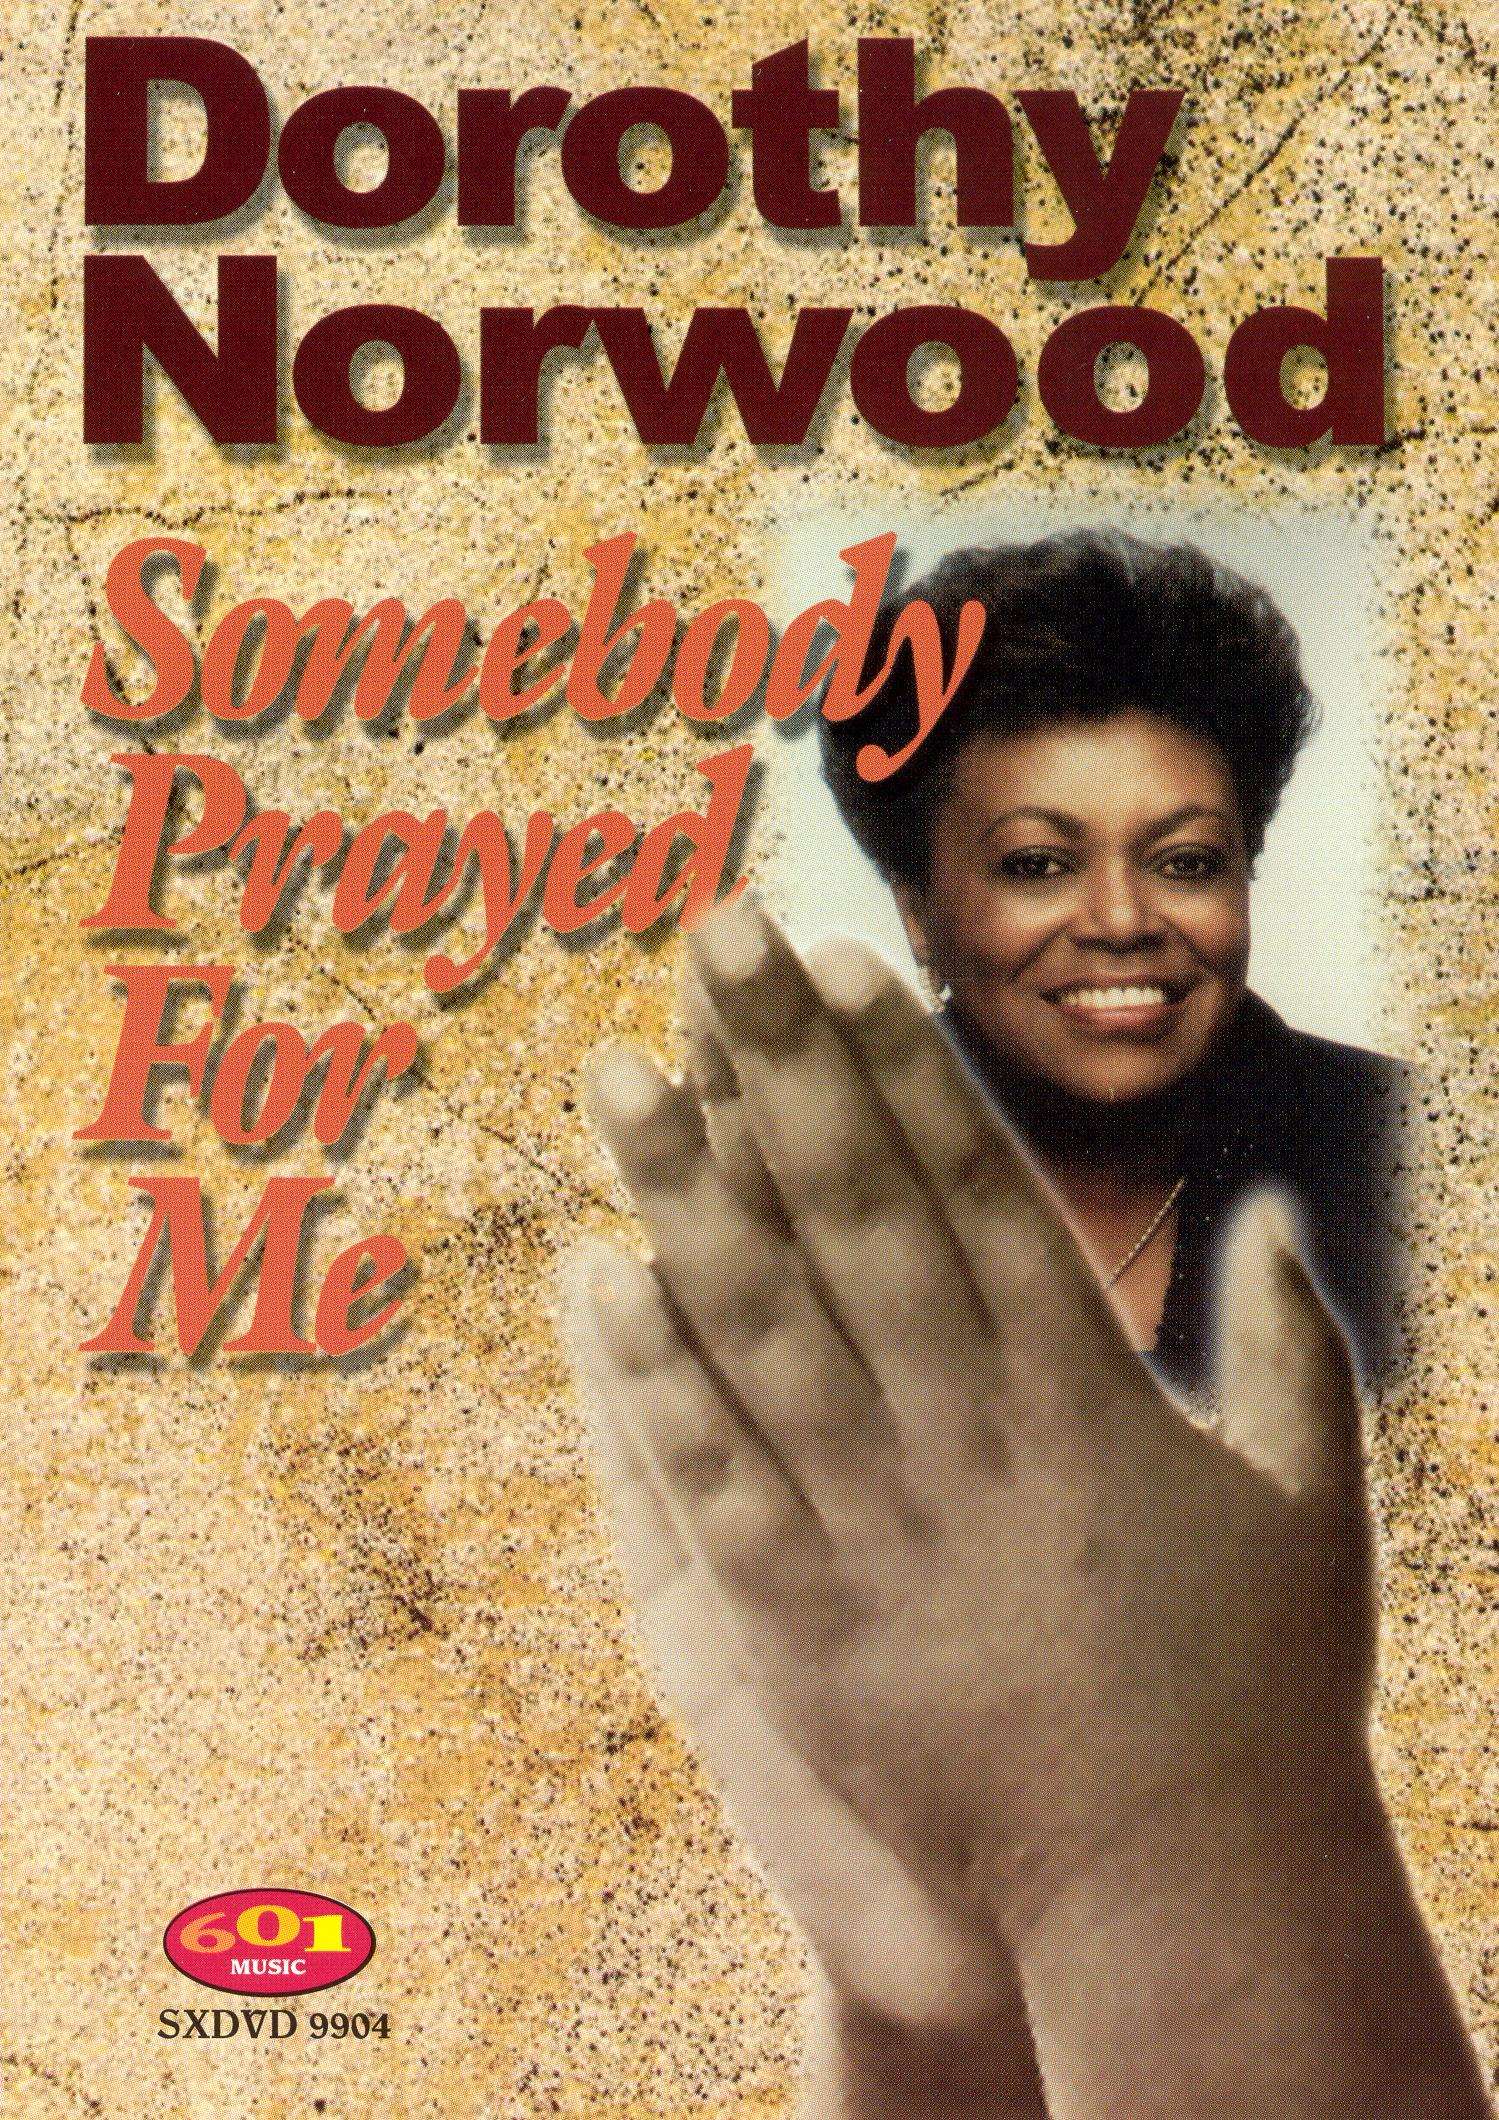 Dorothy Norwood: Somebody Prayed for Me